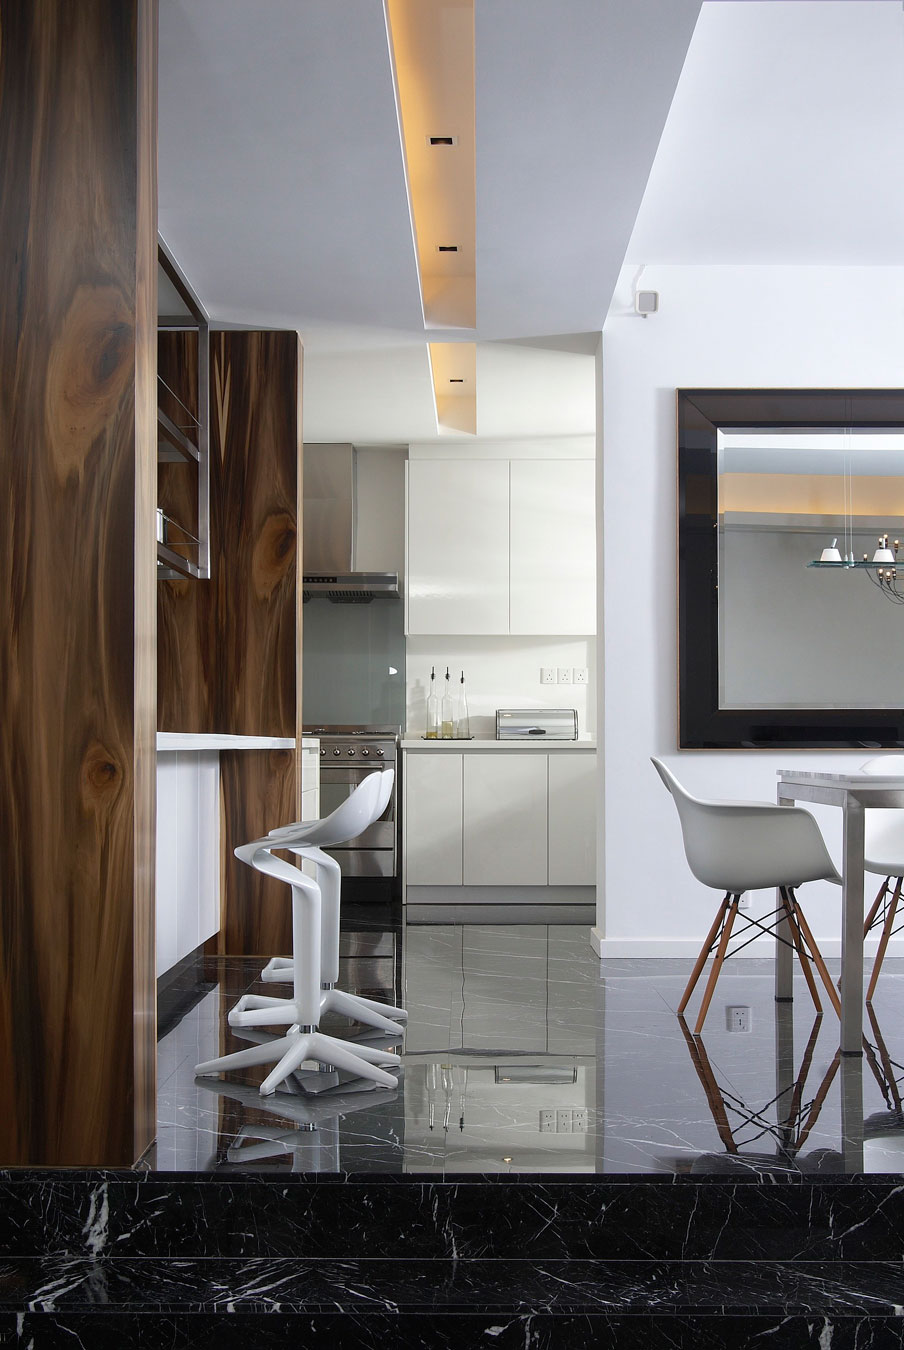 Hillside Bungalow Remodel by Interlink Design Solutions (11)